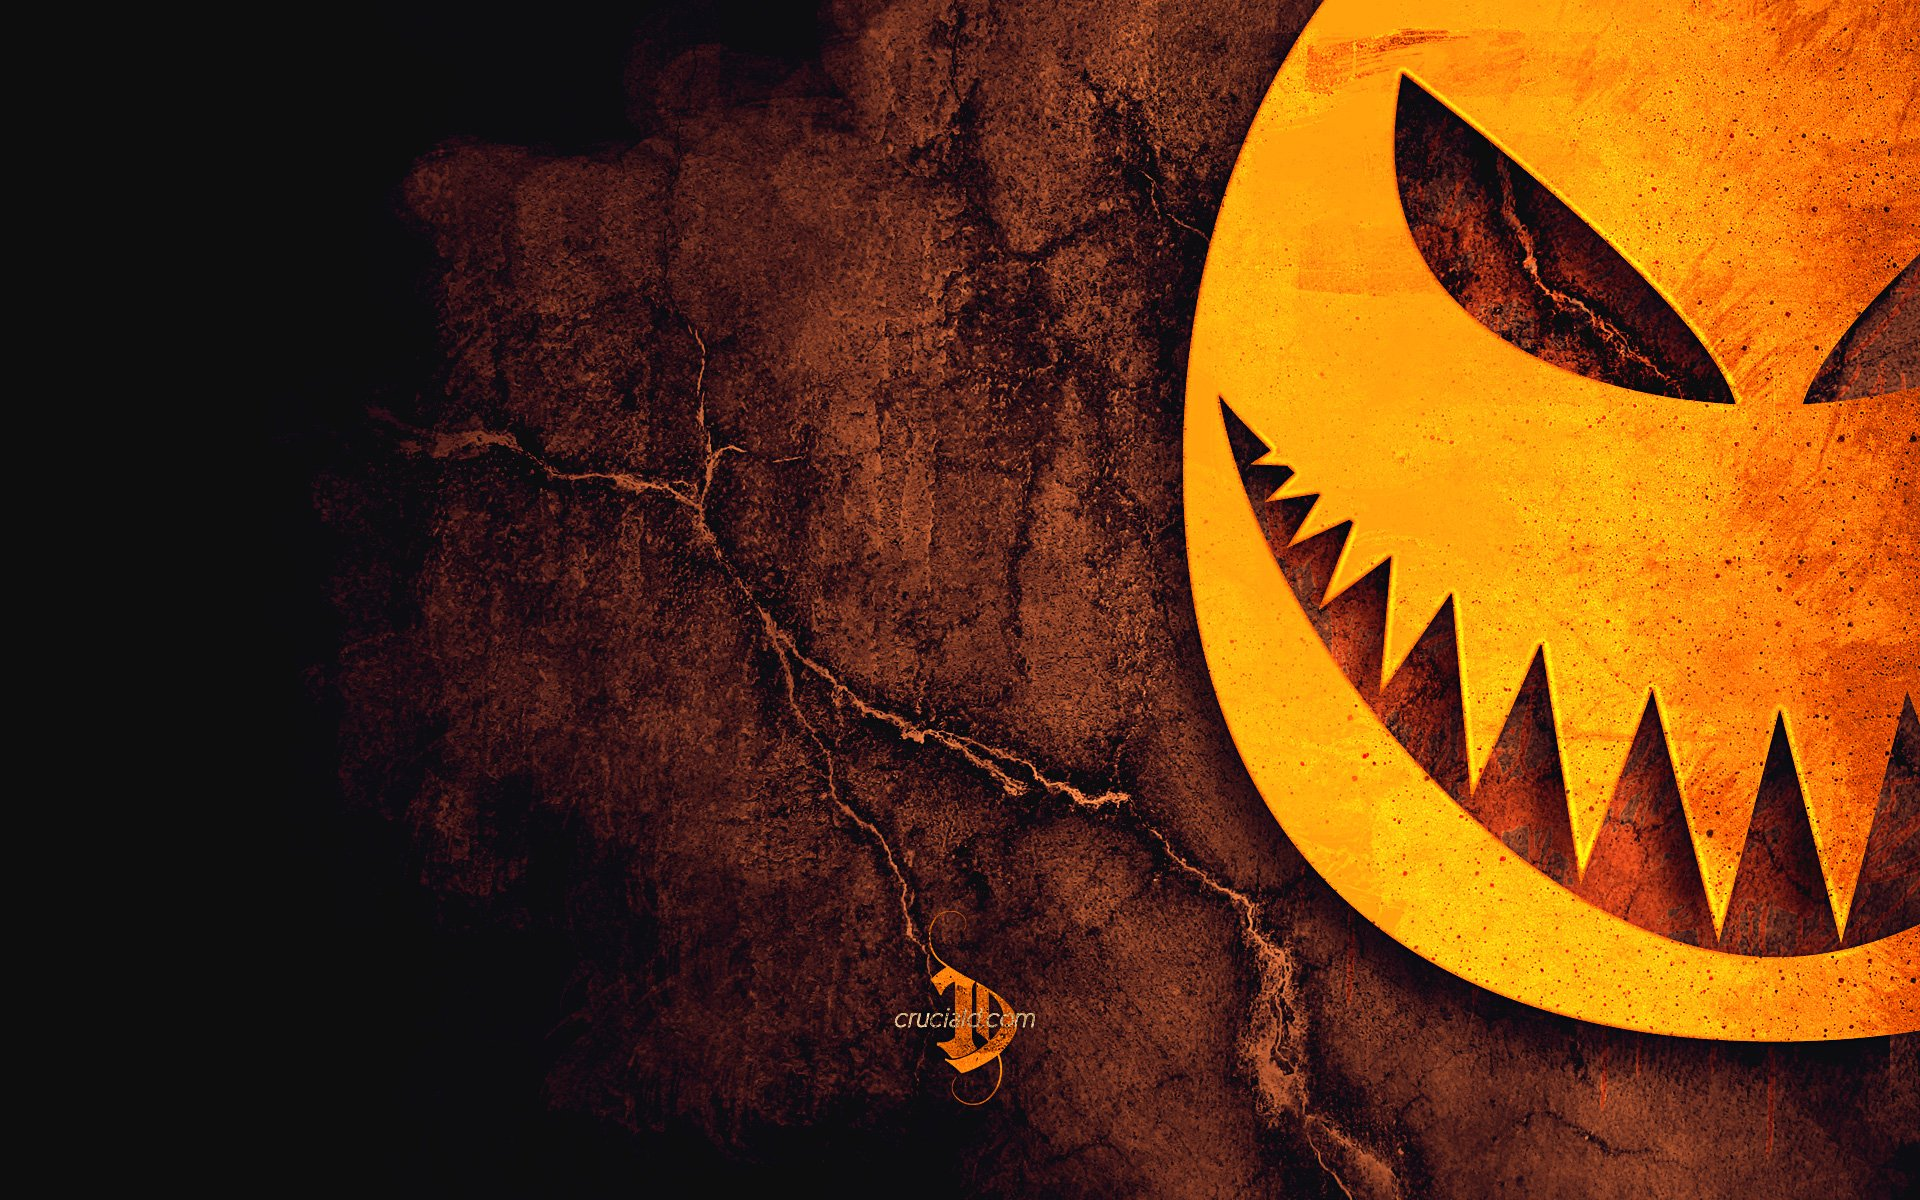 Halloween Wallpaper 1 1920x1200